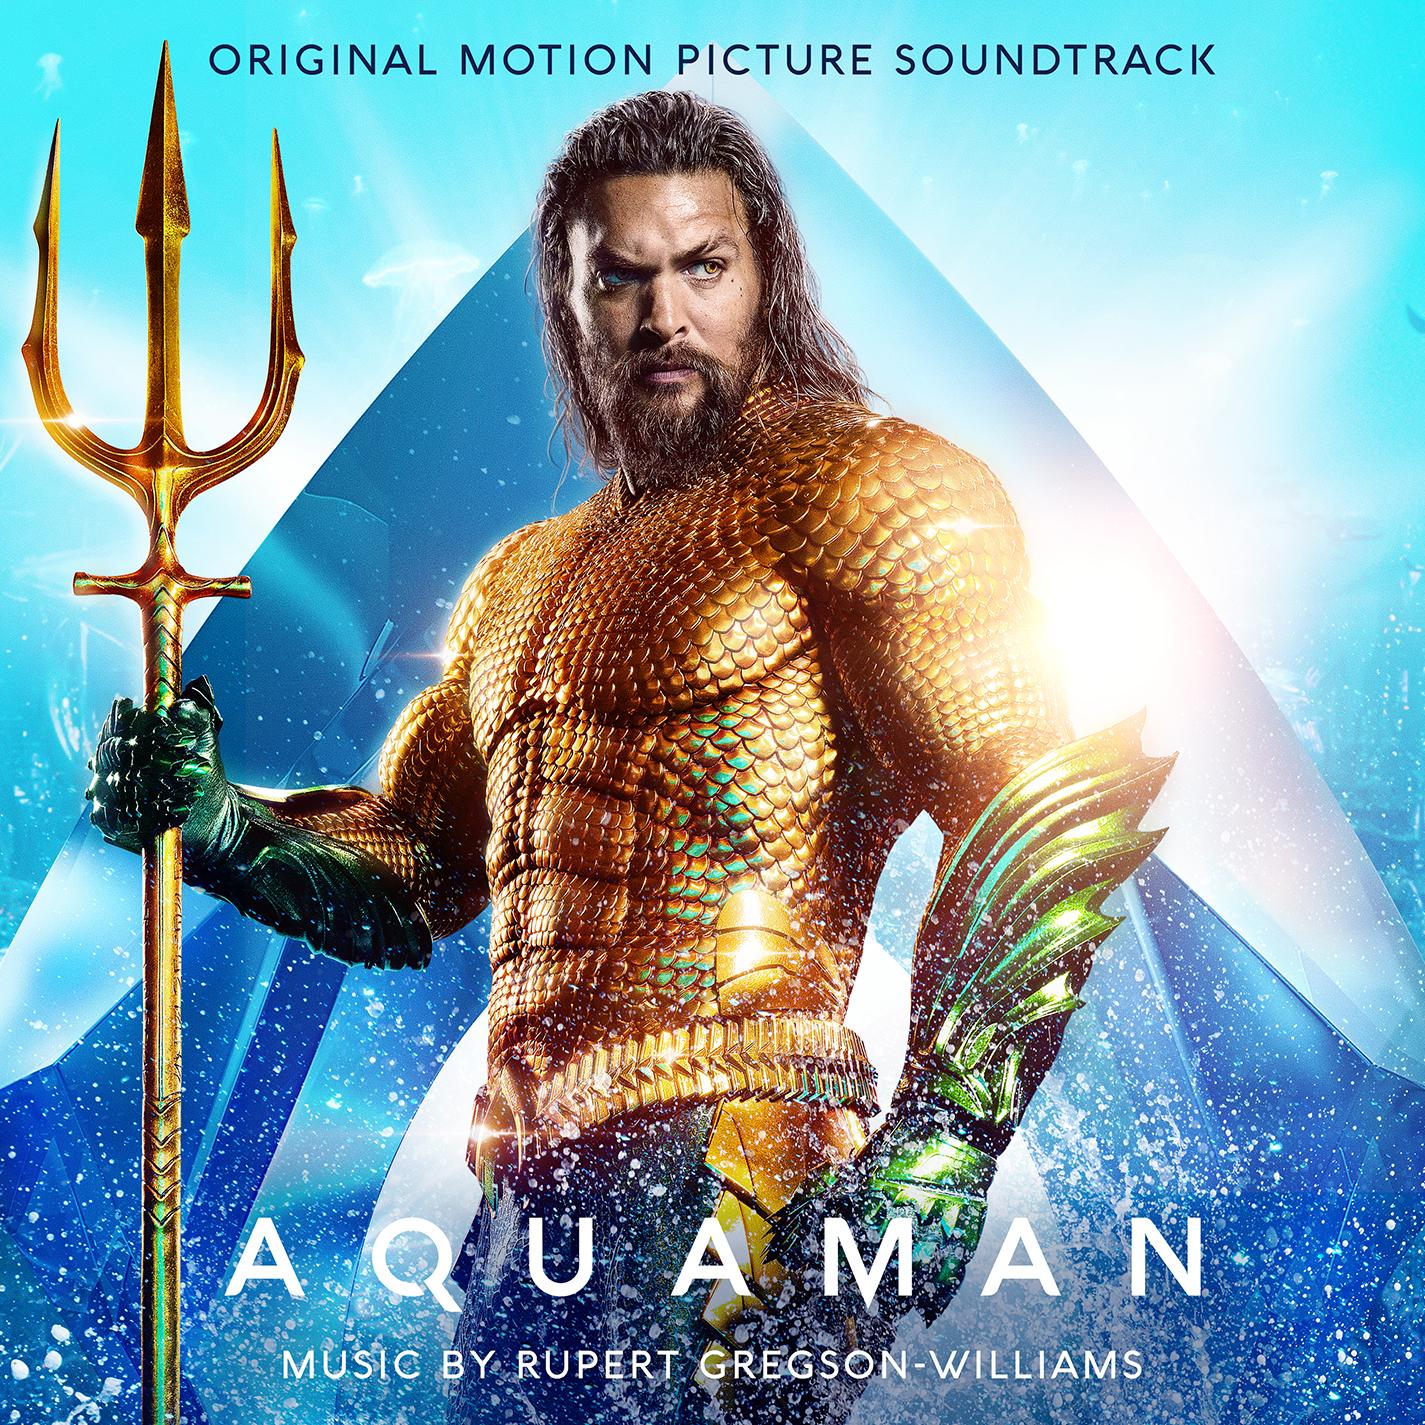 Aquaman: Original Motion Picture Soundtrack Now Available | Business